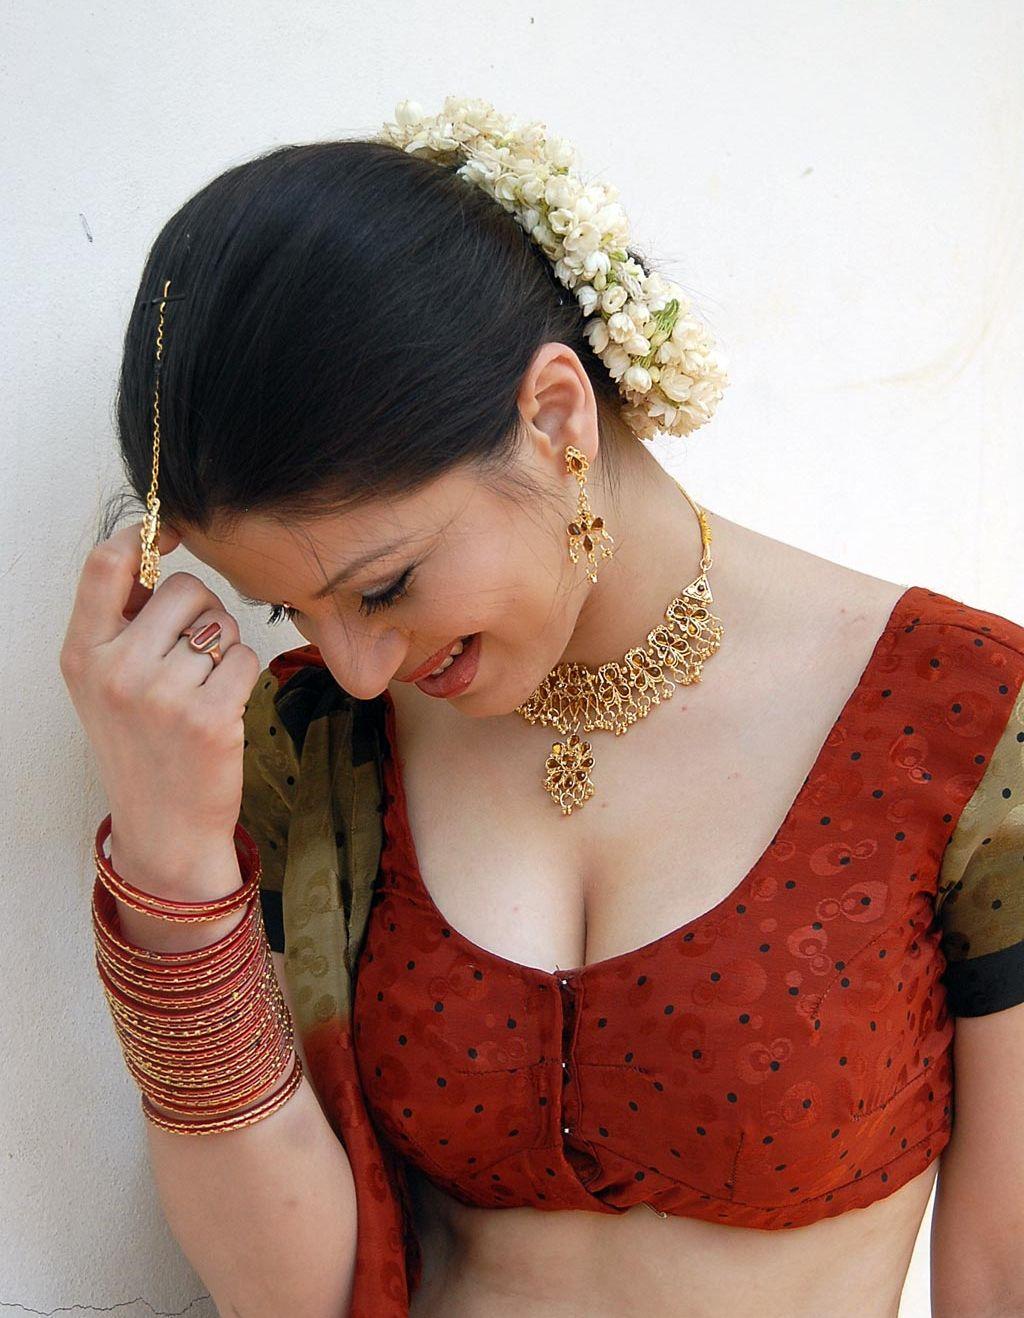 Chandigarh girl bj - 3 1